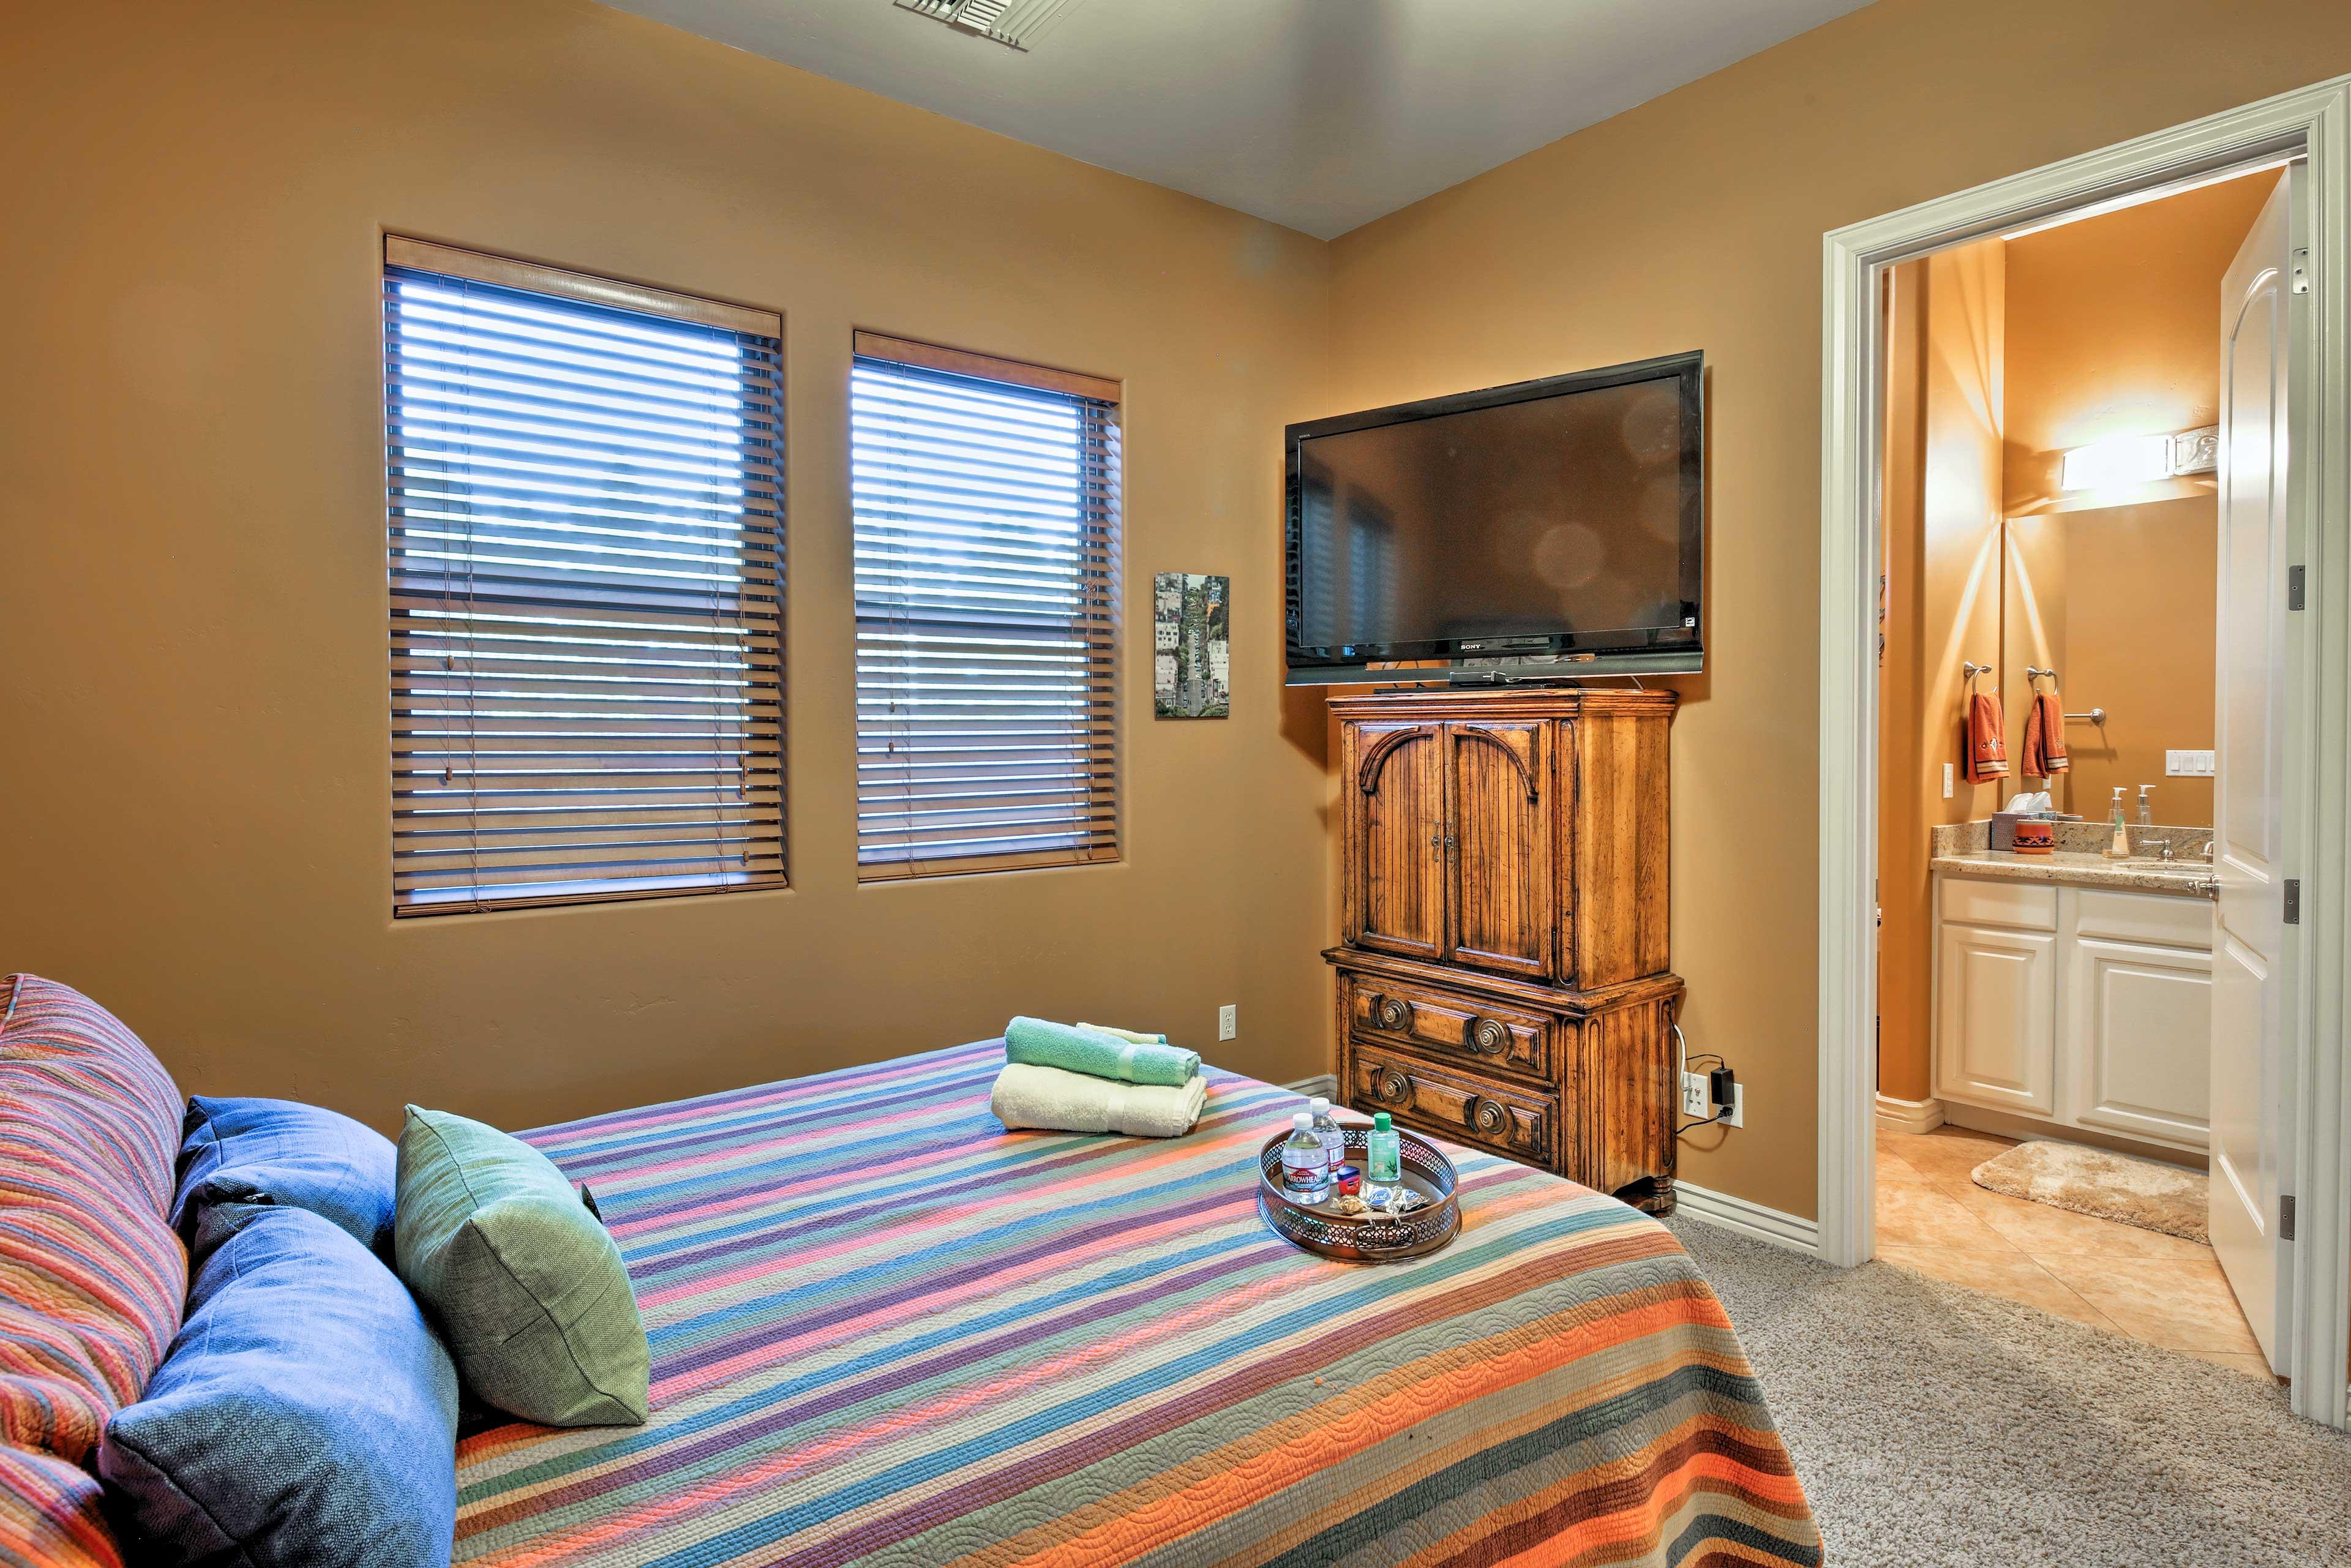 The bedroom features 2 windows, a flat-screen TV and en-suite bathroom.